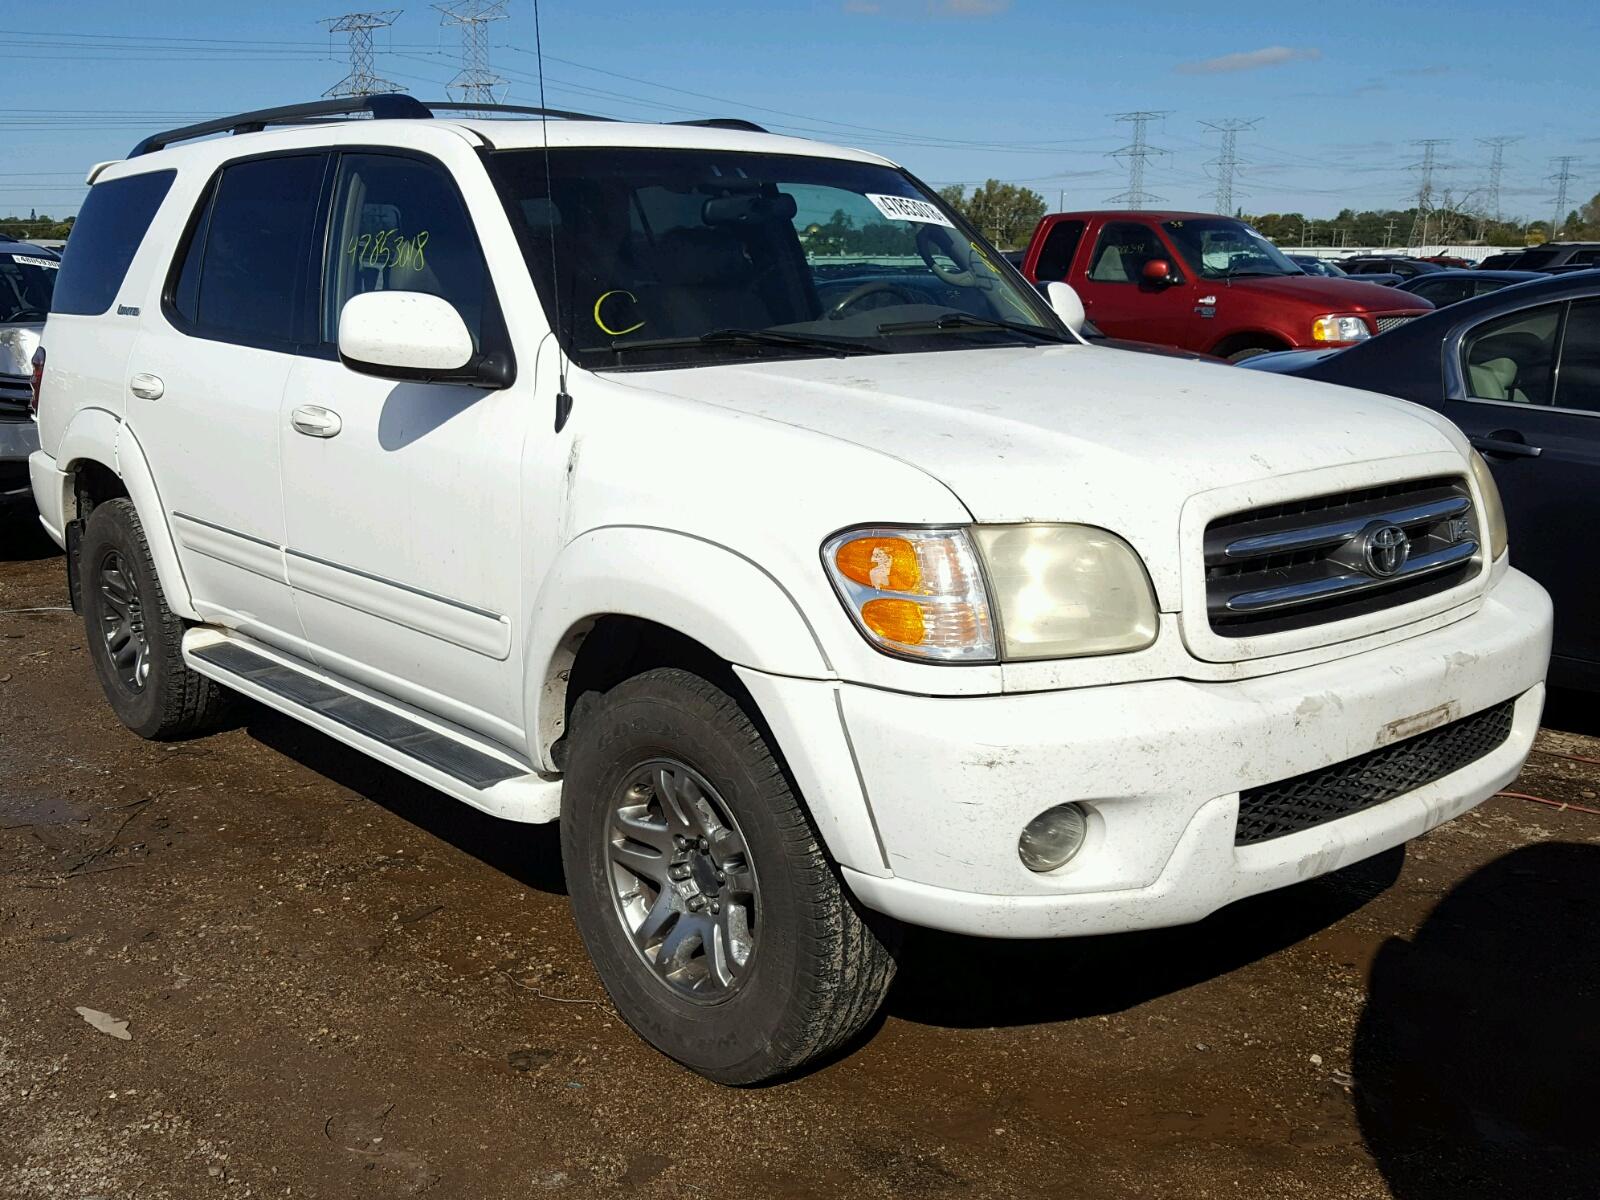 2004 Toyota Sequoia Li For Sale At Copart Elgin Il Lot 47853018 Loaded